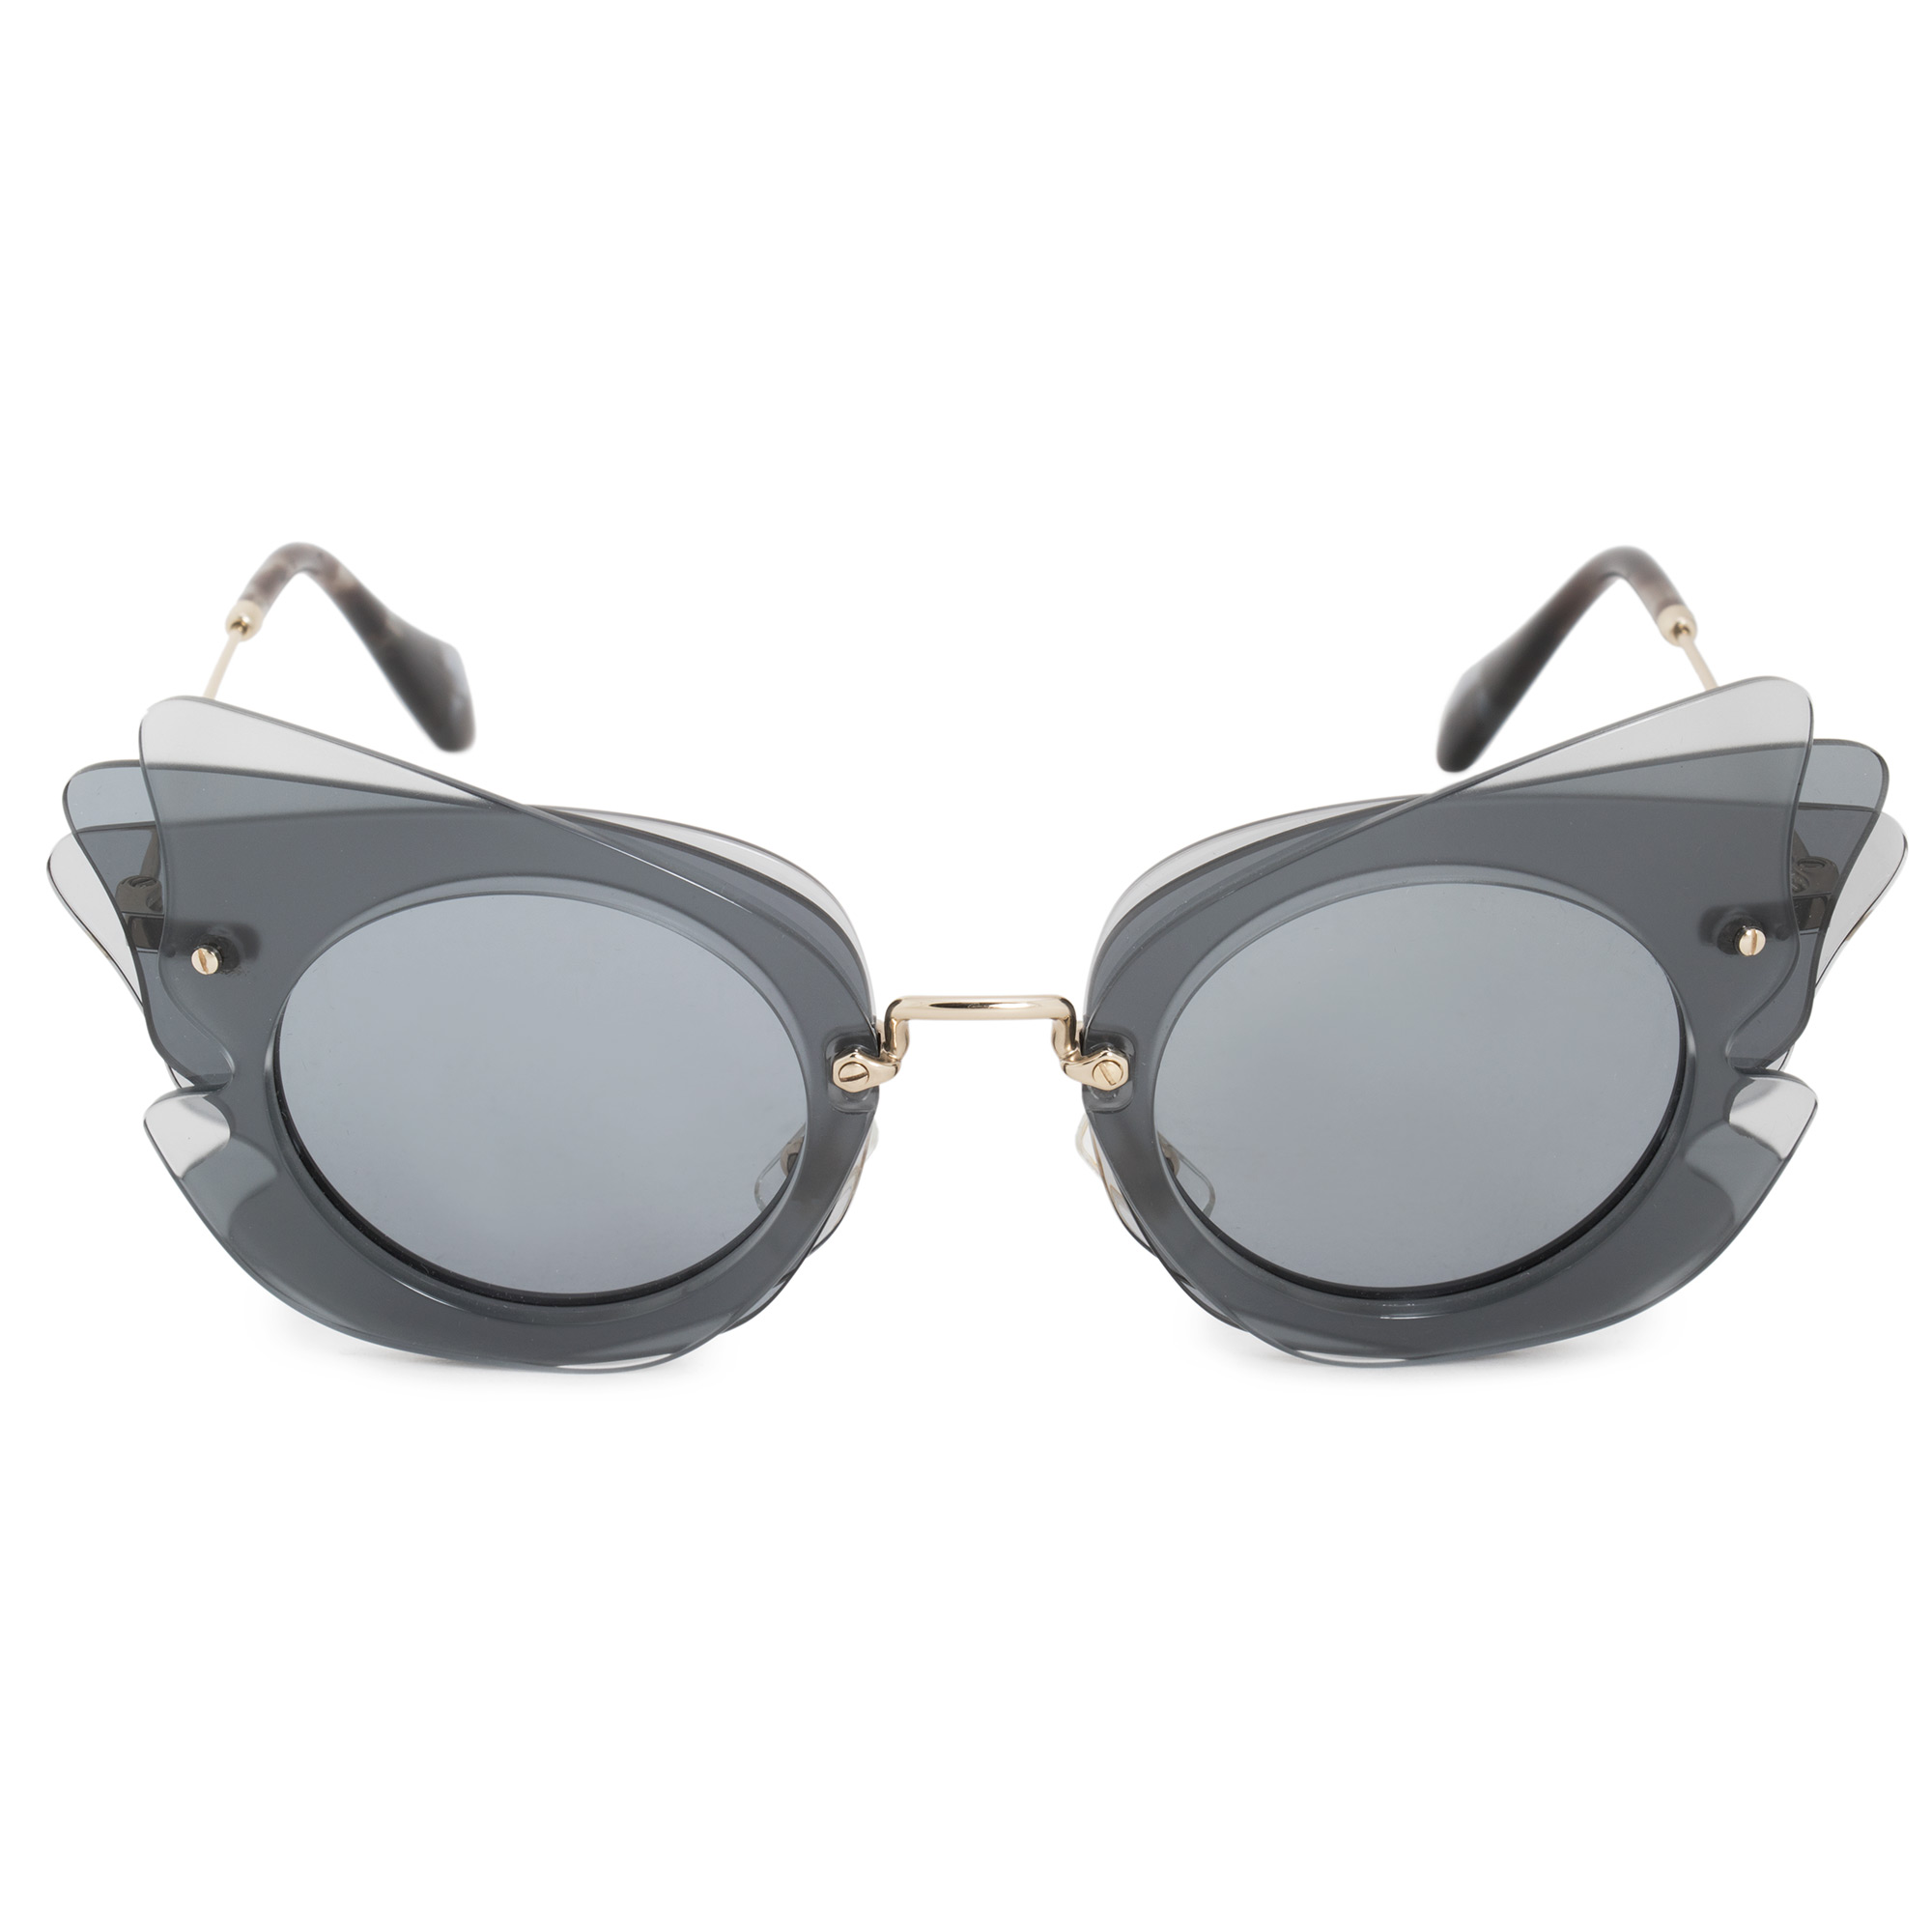 6cd01843833 Miu Miu Butterfly Sunglasses SMU02SS VA43C2 63 8053672686777